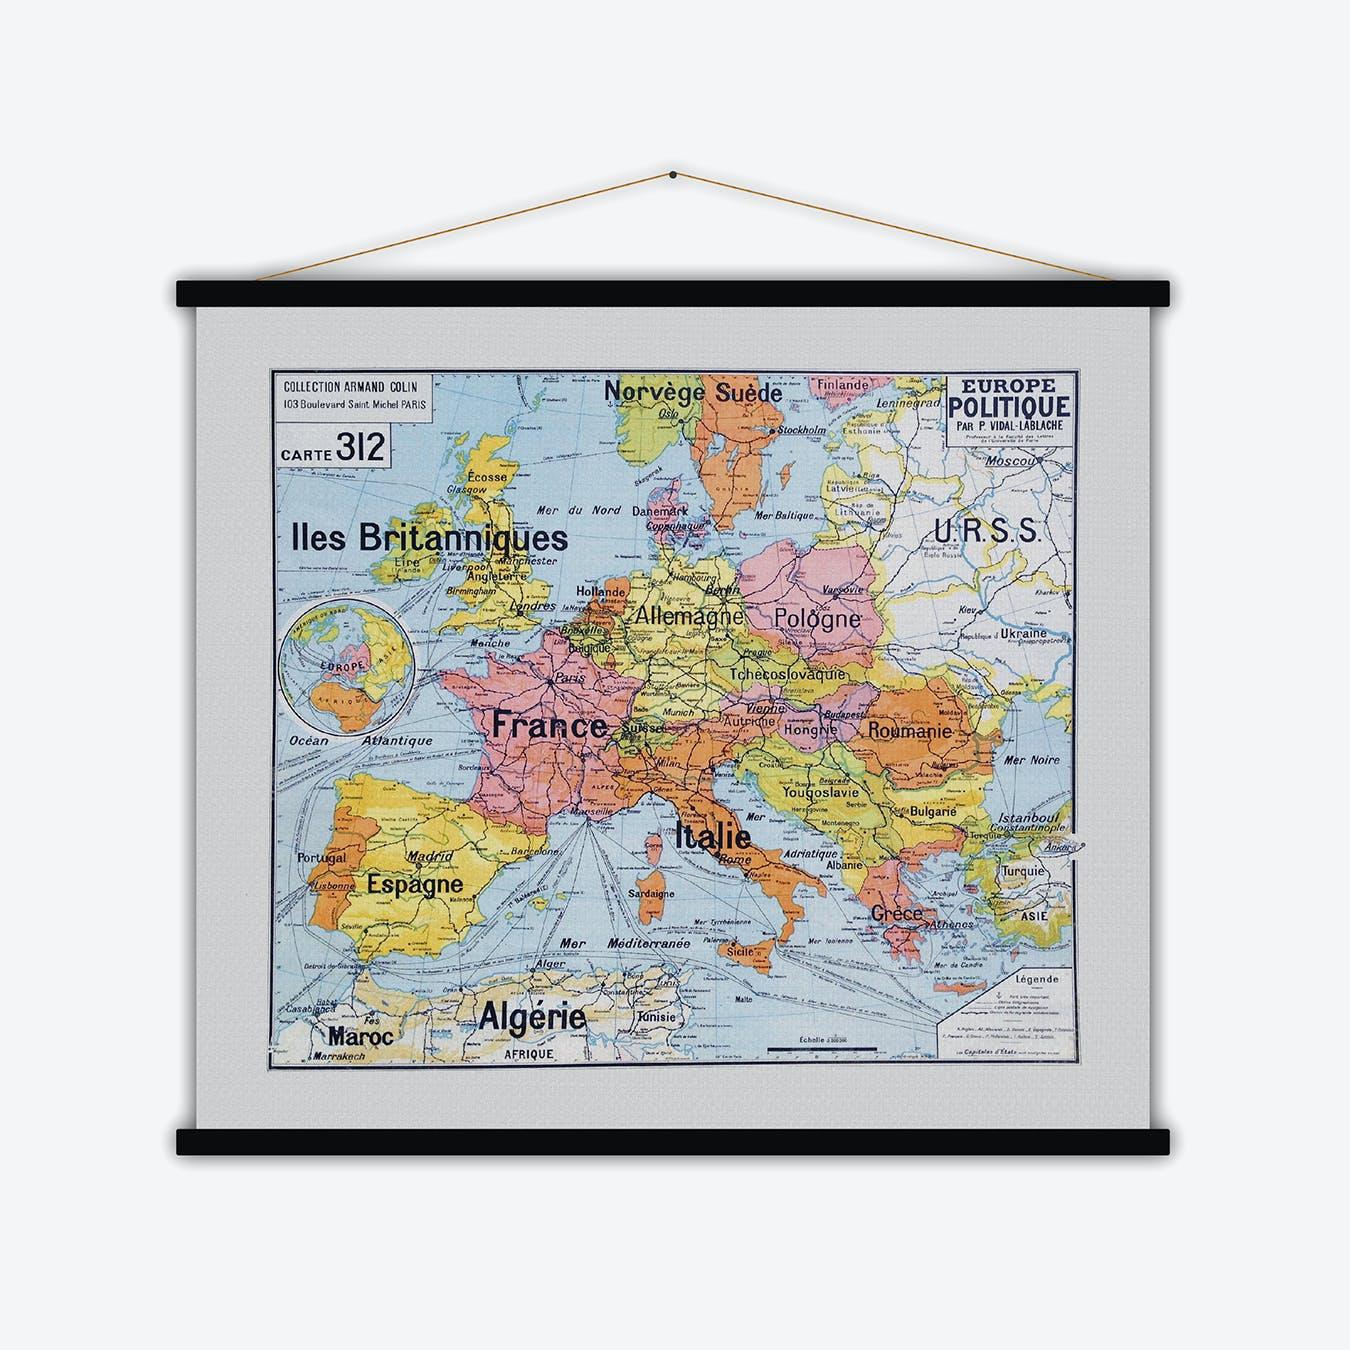 Europe Politique Vintage Map